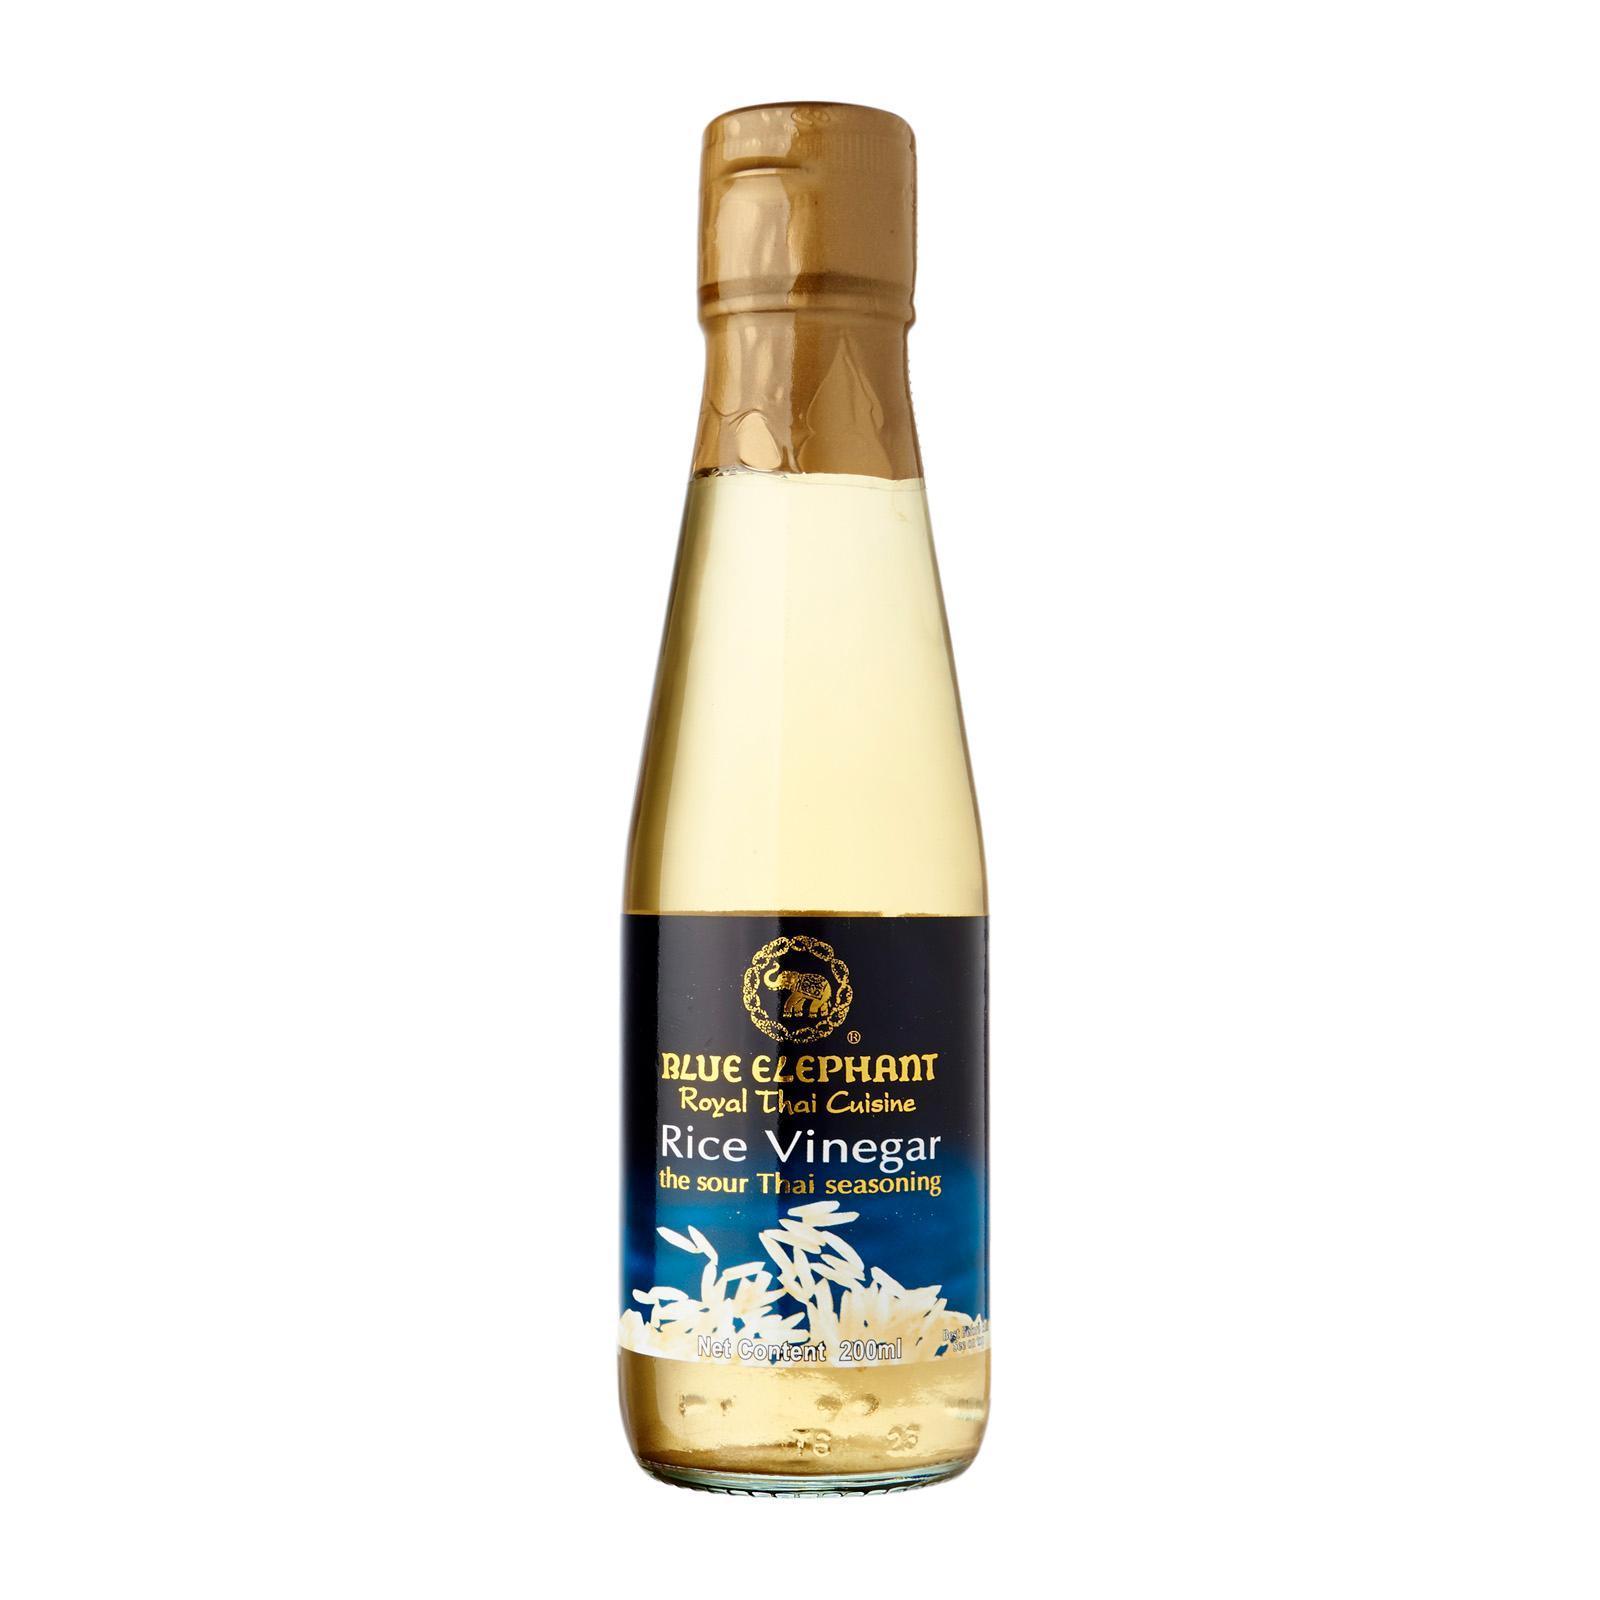 Blue Elephant Rice Vinegar